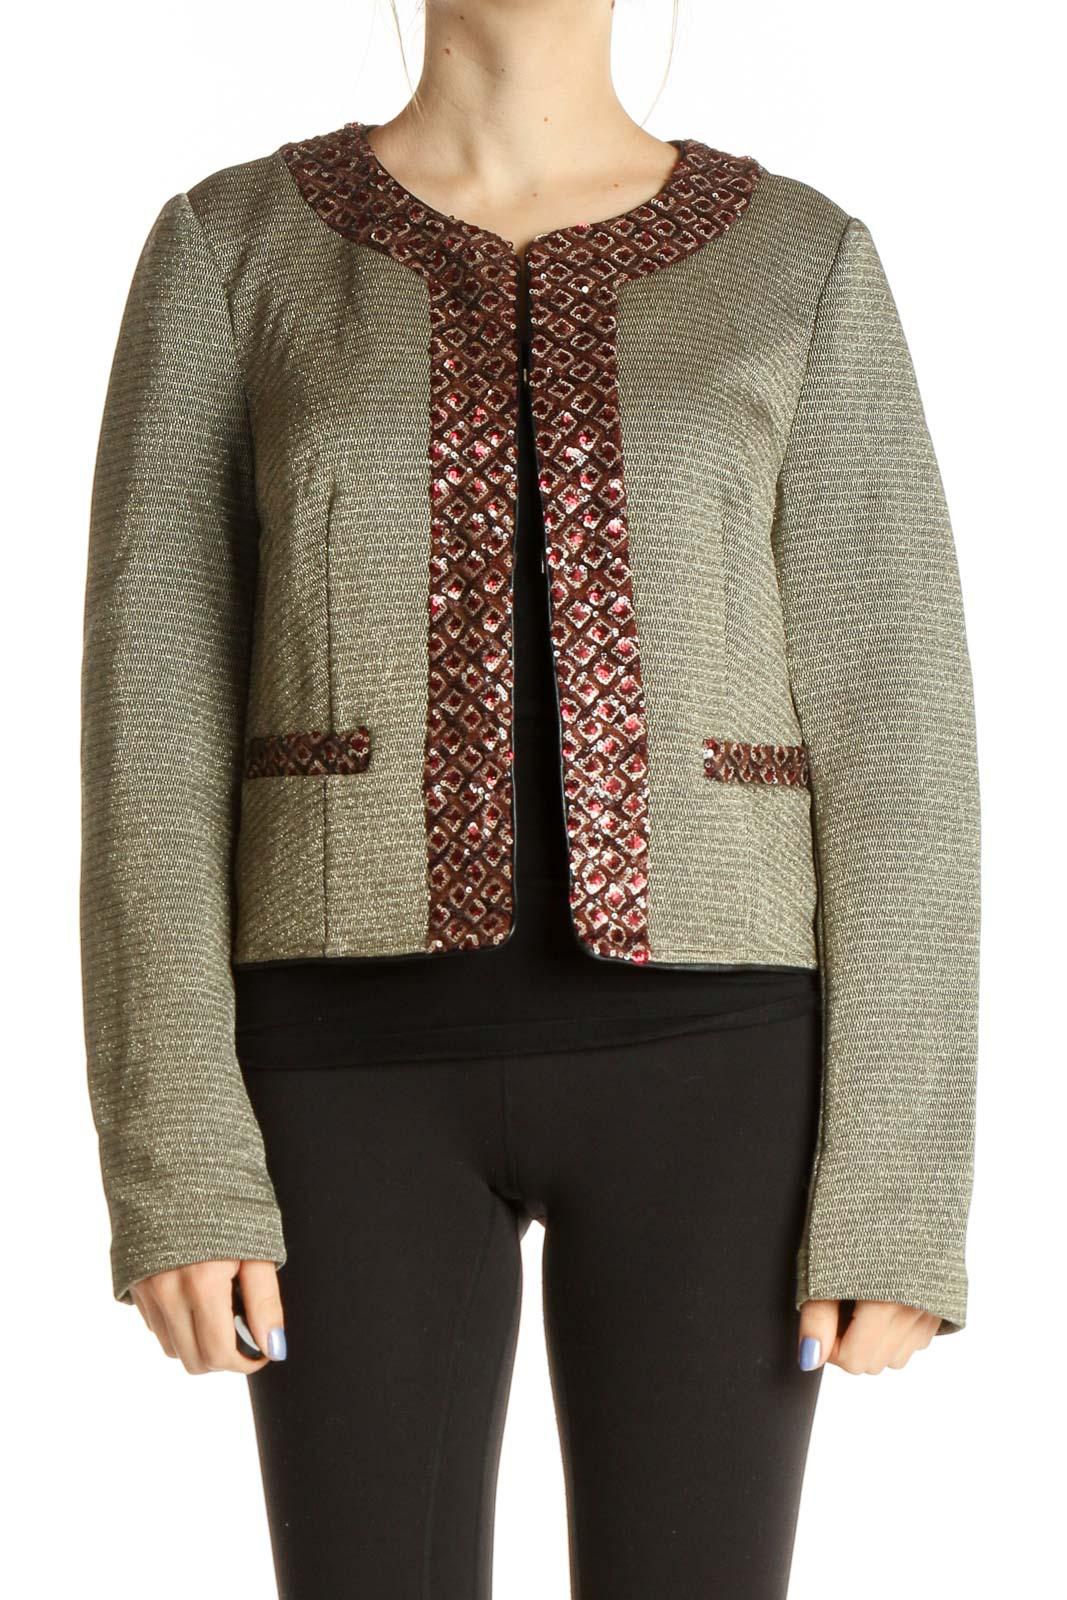 Gray Sequin Jacket Front